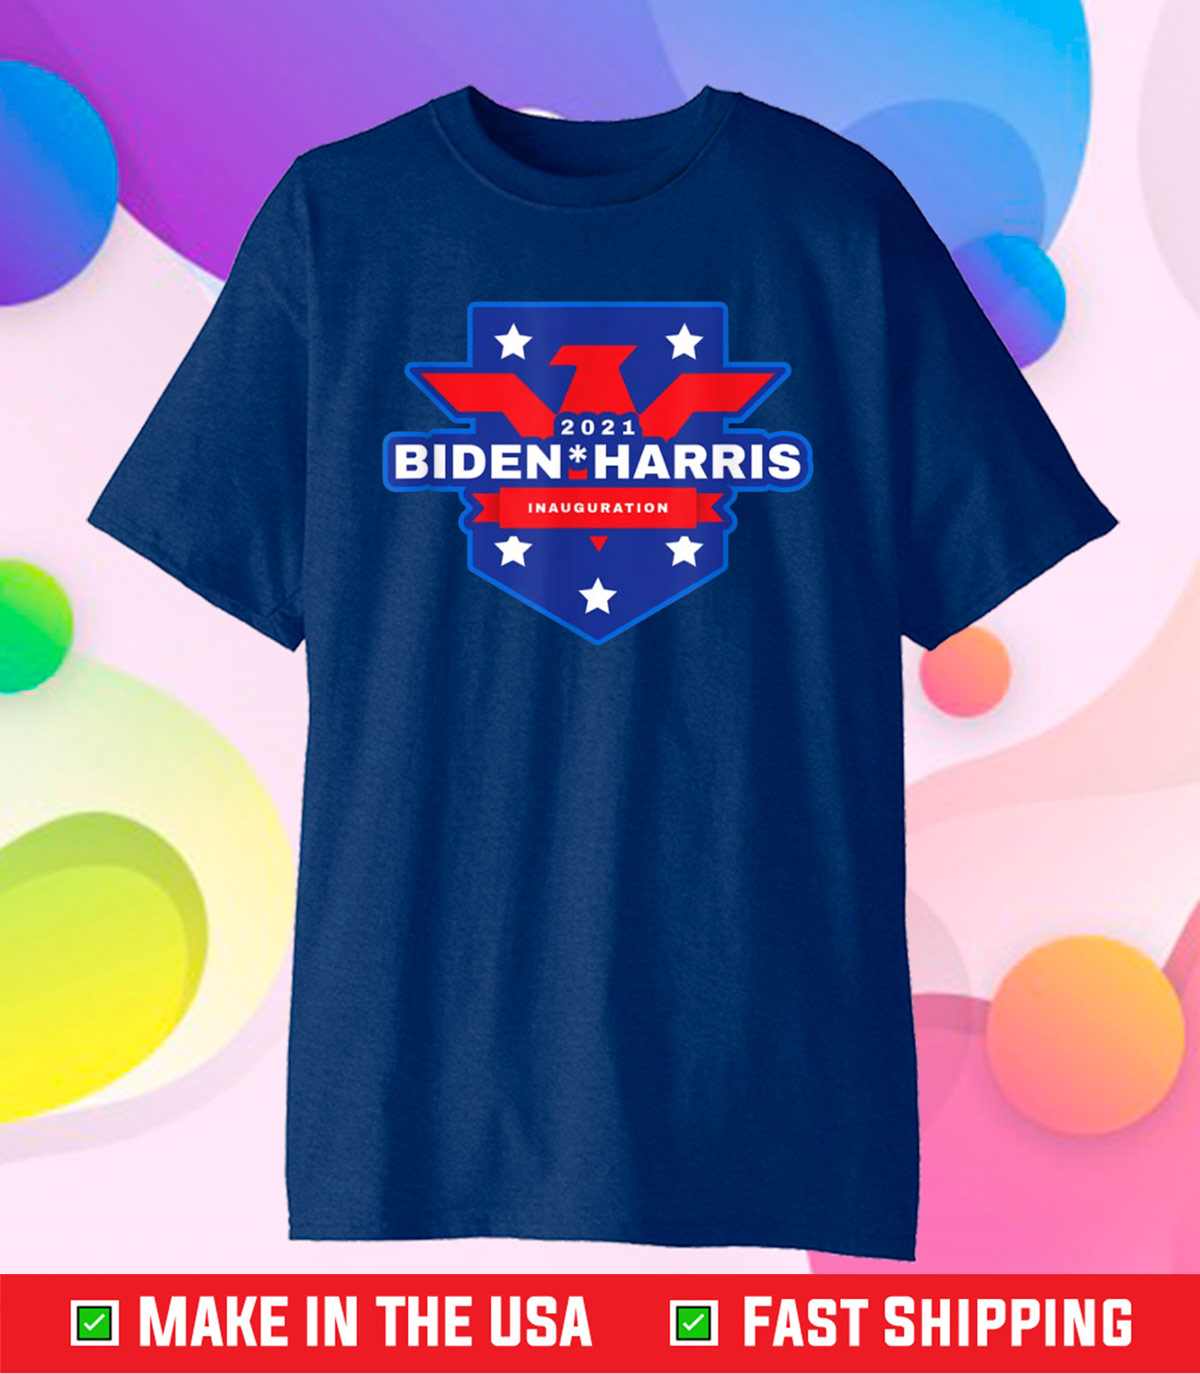 Biden Harris 2021 Inauguration Commemorative Souvenir Classic T-Shirt